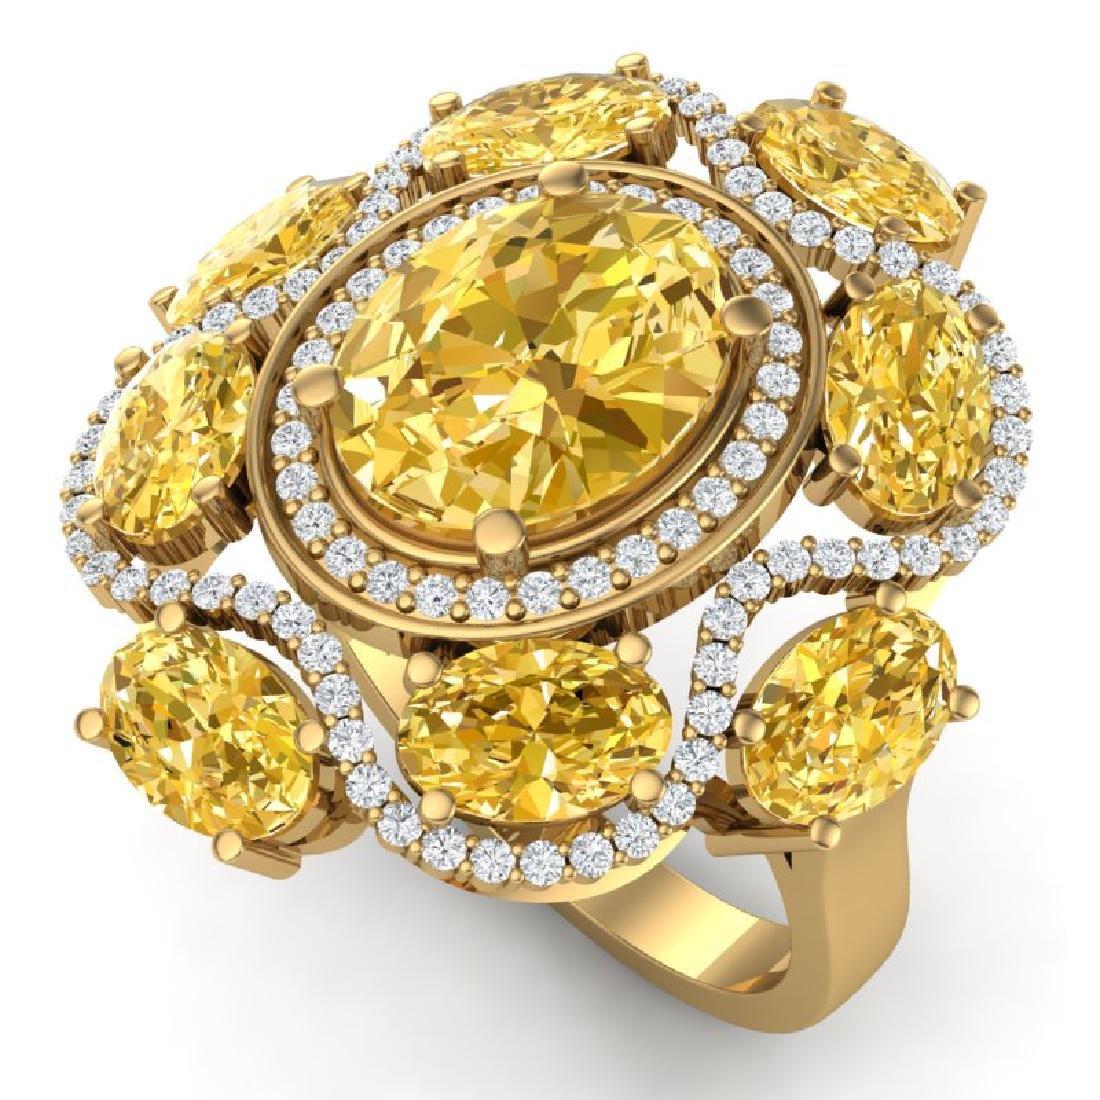 7.68 CTW Royalty Canary Citrine & VS Diamond Ring 18K